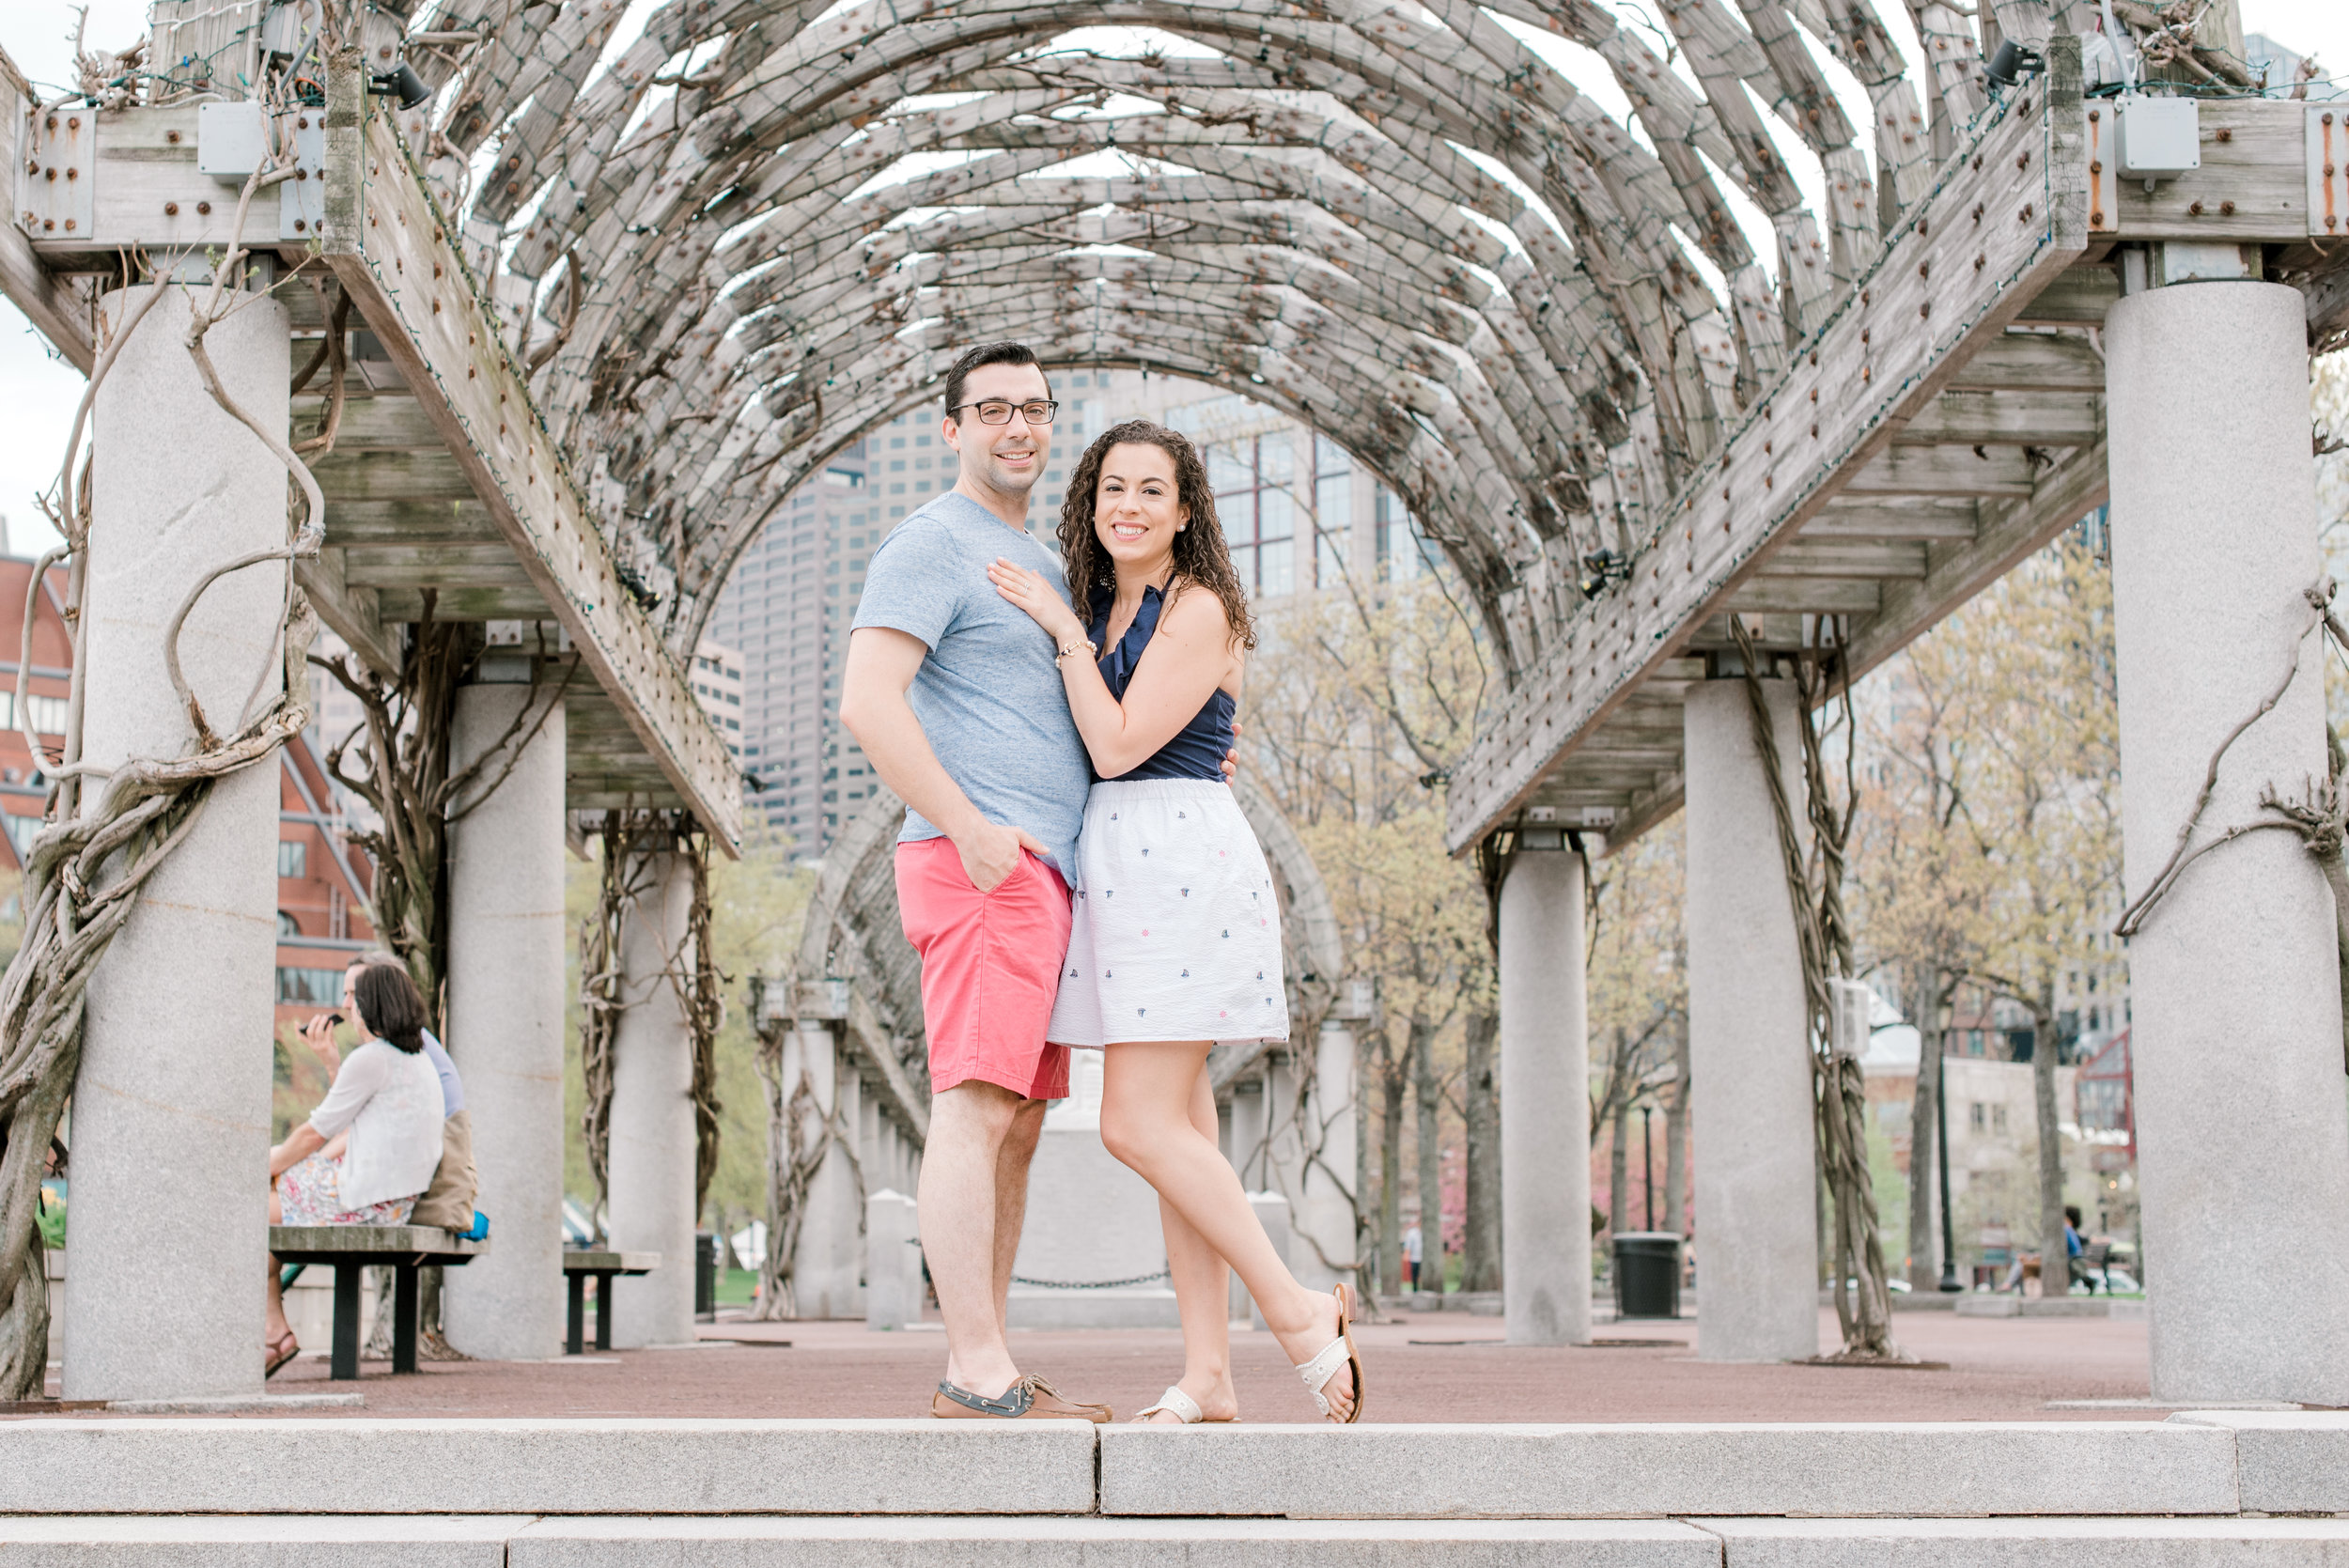 Brianna-and-Brian-engagement-2018-66.jpg